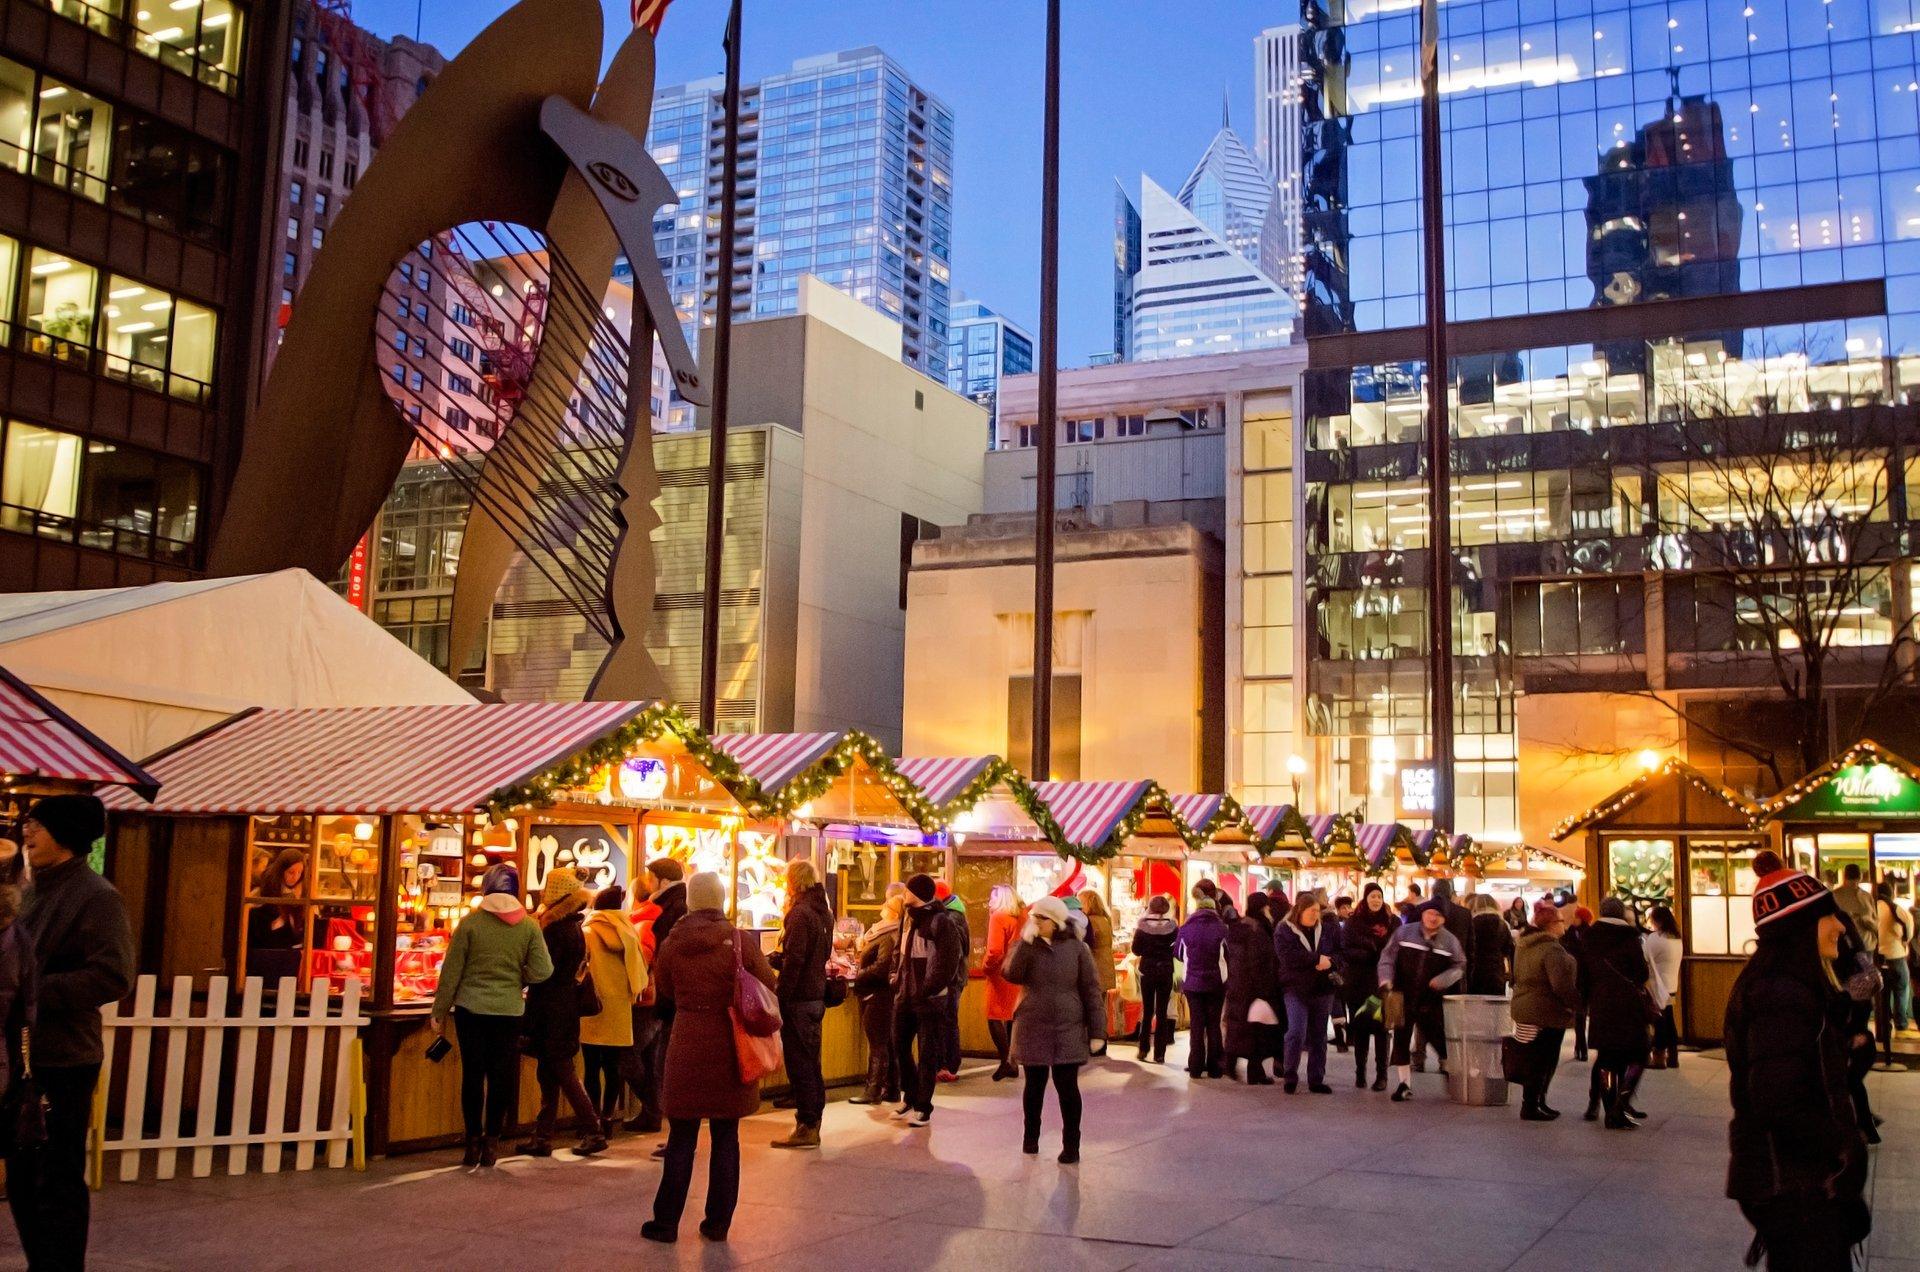 Chicago Christmas Market Dates 2020 Christkindlmarket Chicago 2019   Dates